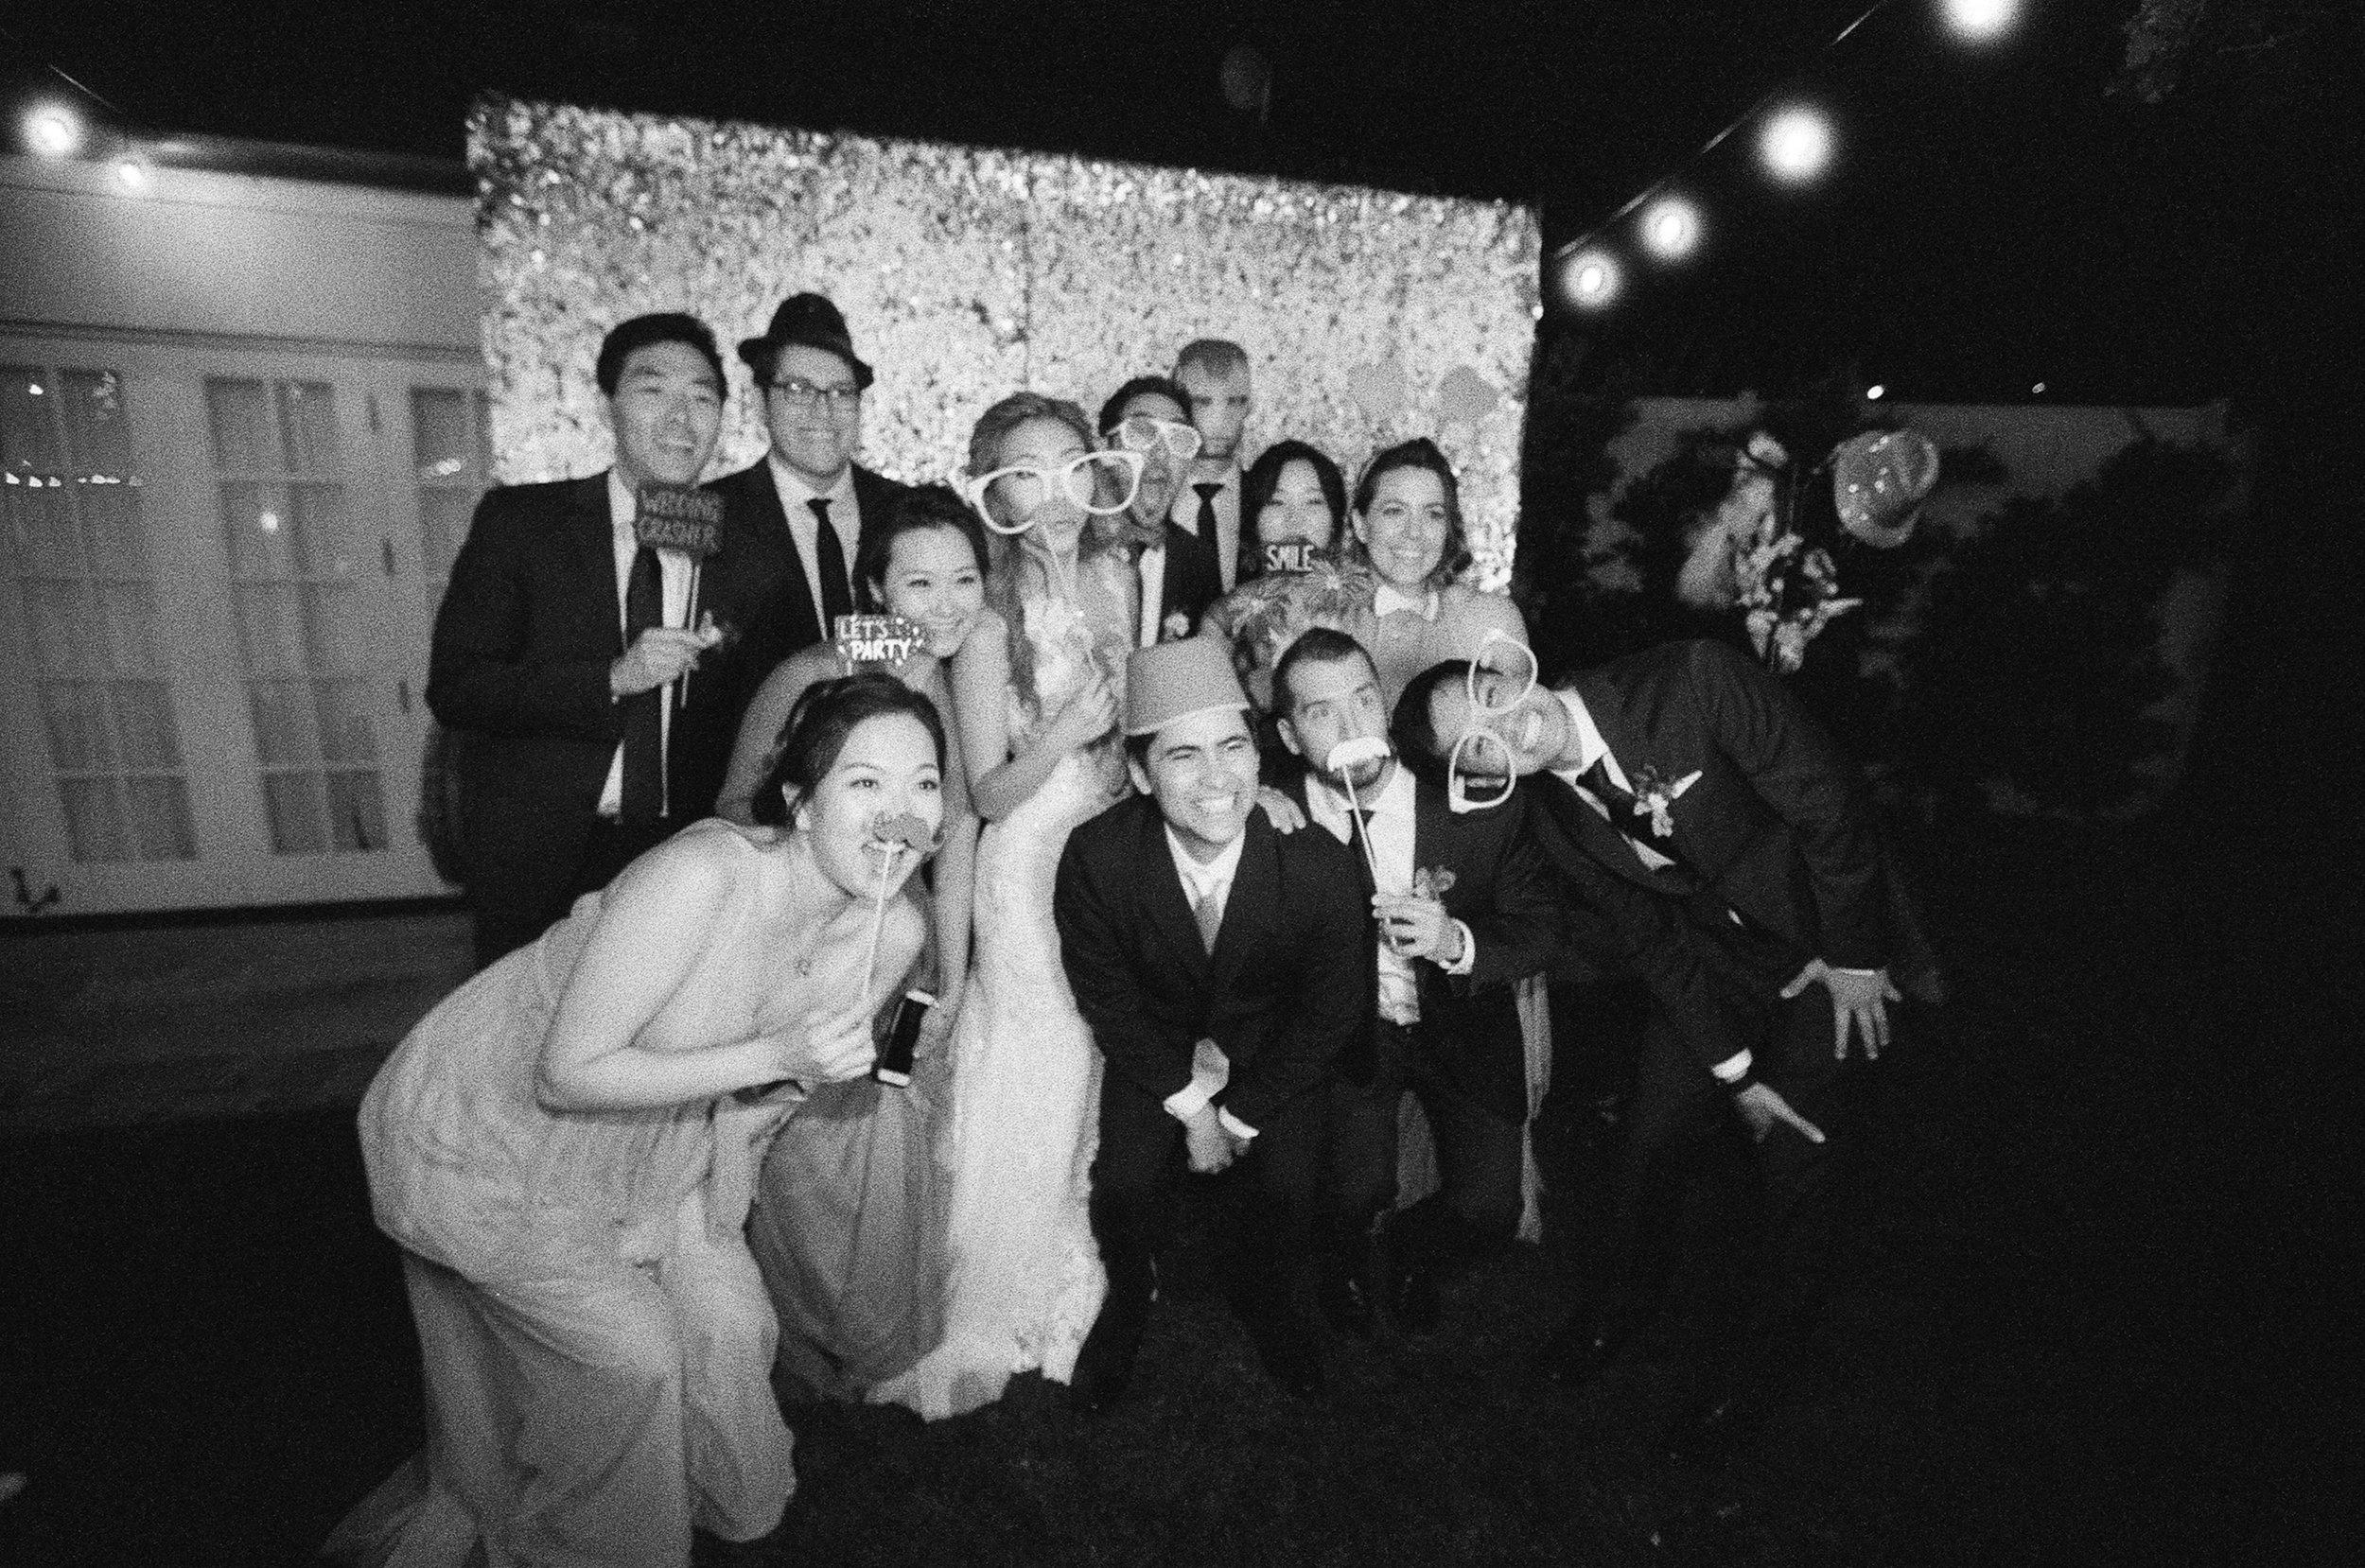 Triunfo_Creek_Winery_Wedding-307-Jen-Huang-JL_Jen_Huang_KB_(210).jpg